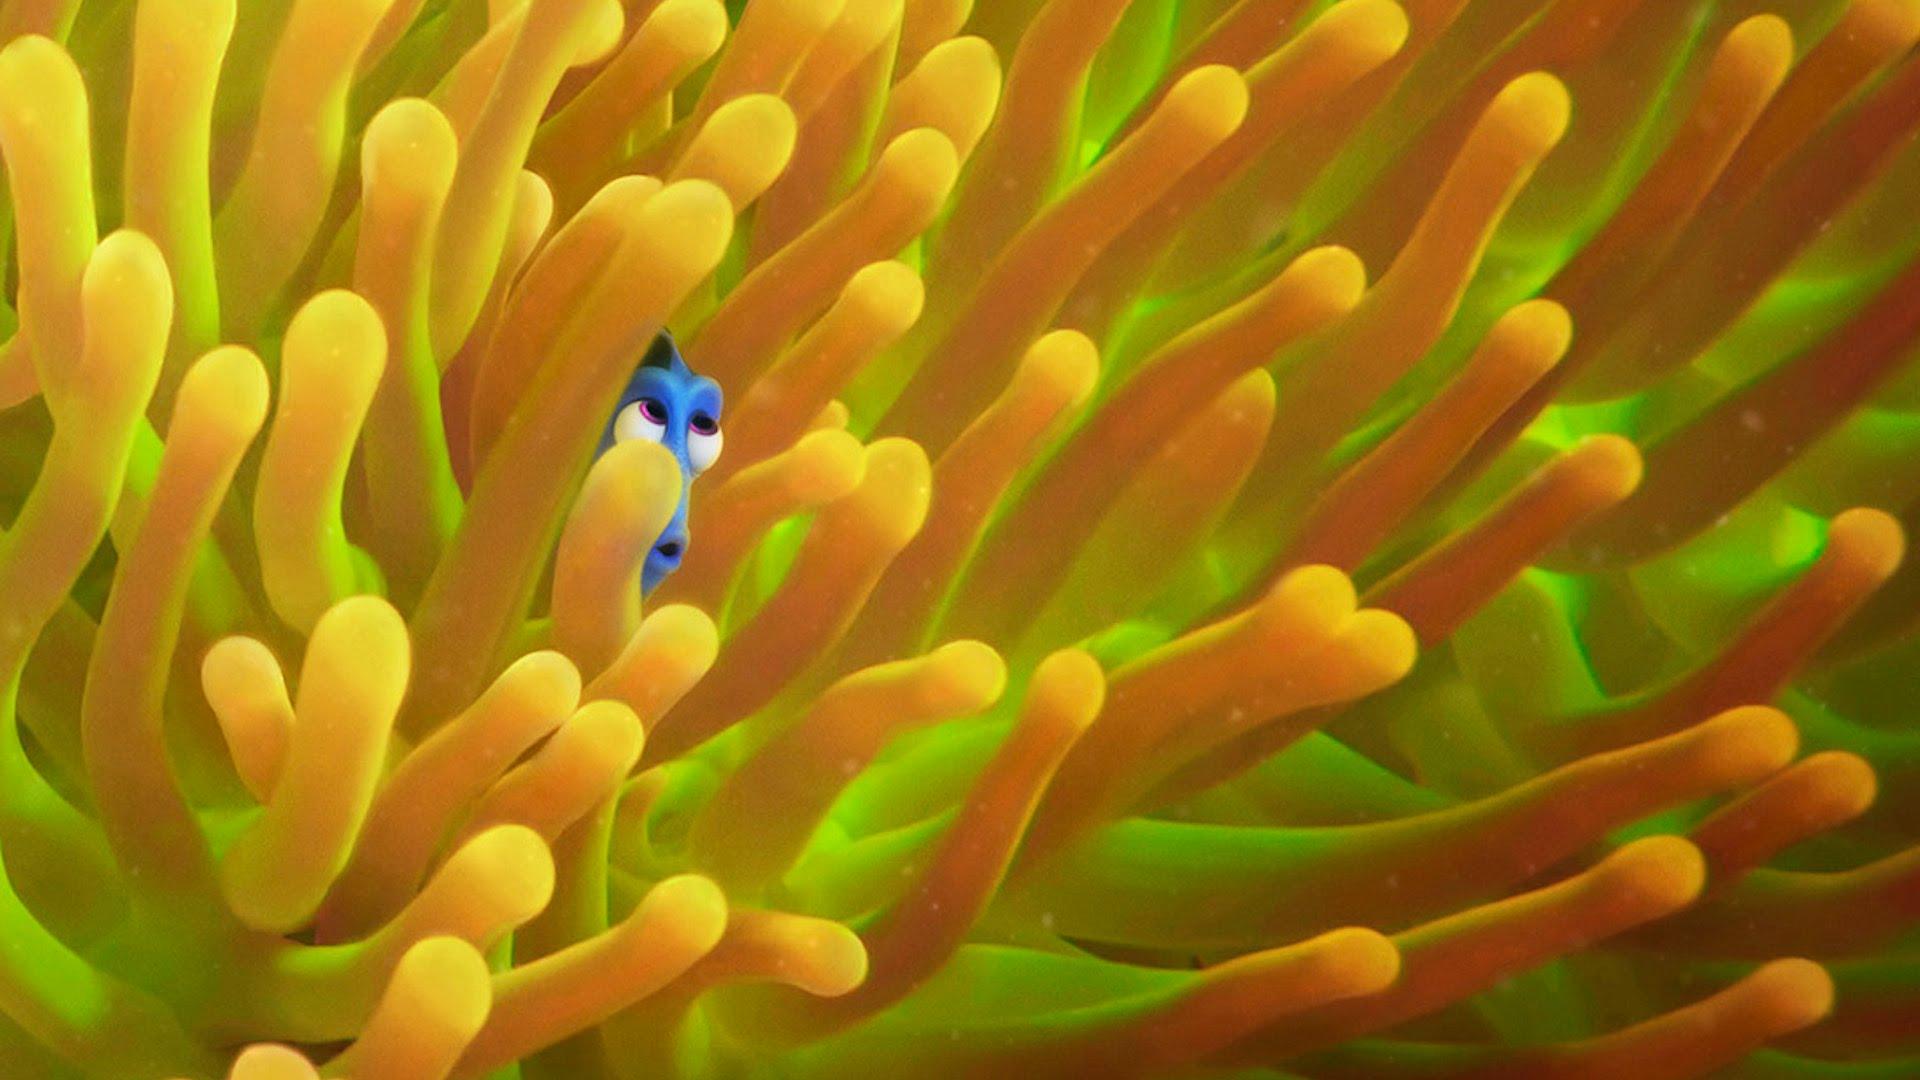 """Finding Dory"" bekam noch einen neuen Trailer! Whoop Whoop!"